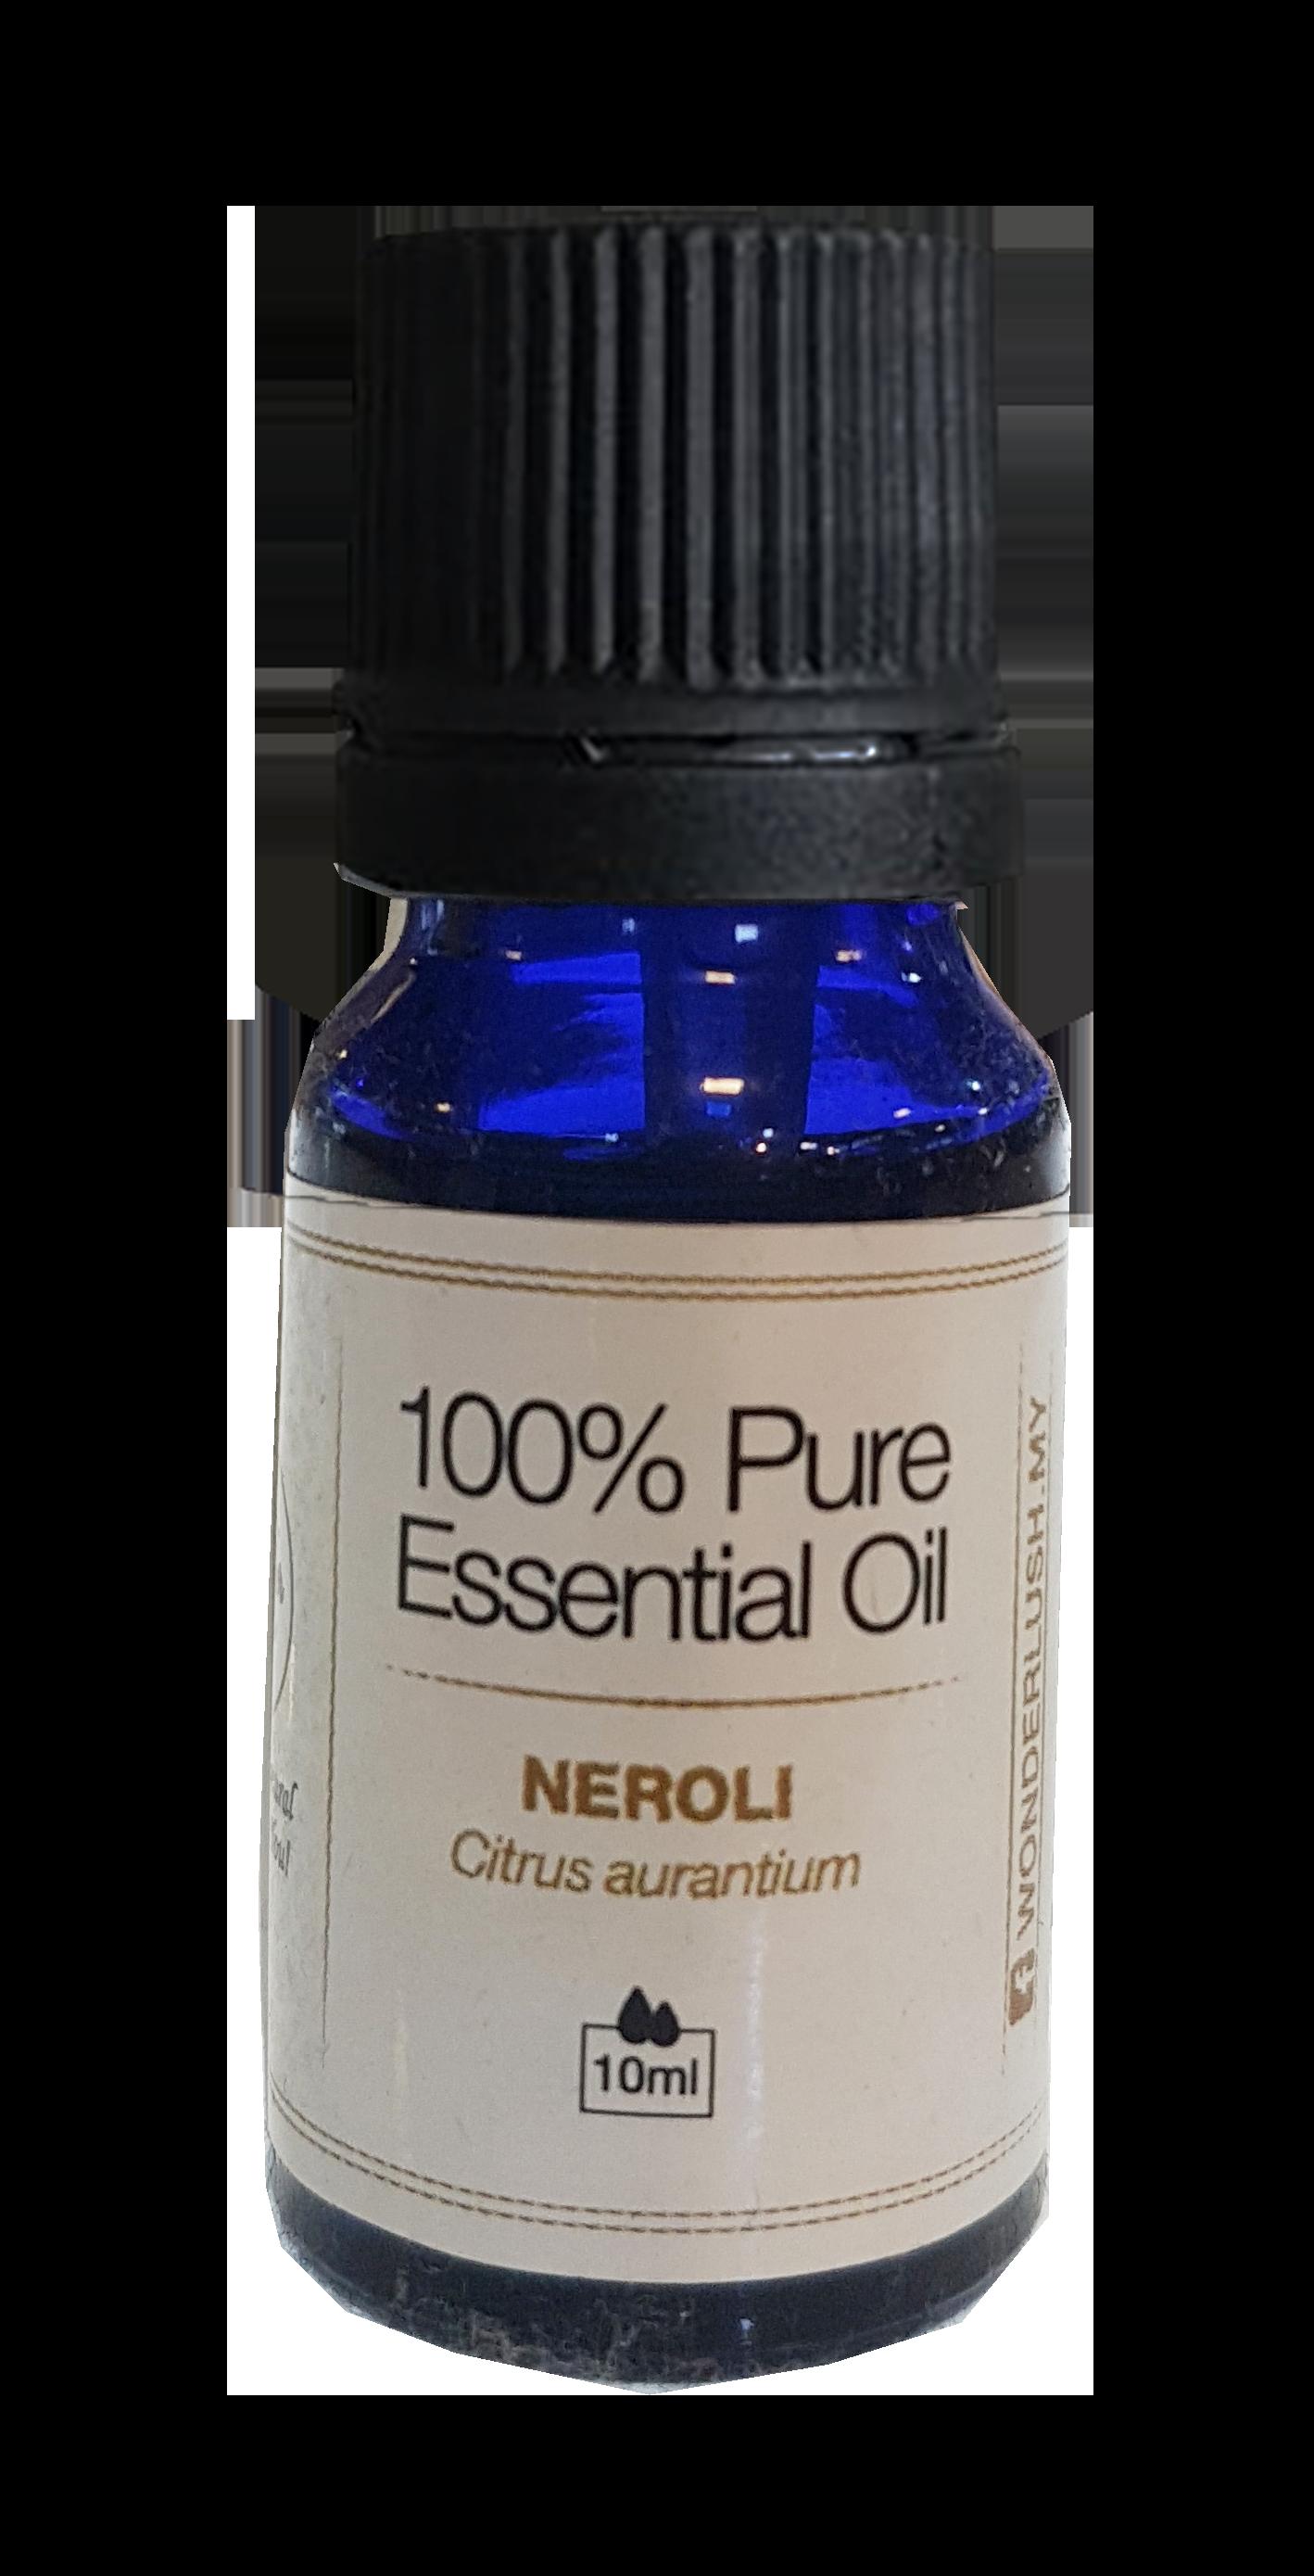 [MPLUS] Wonderlush Neroli Essential Oil 10Ml